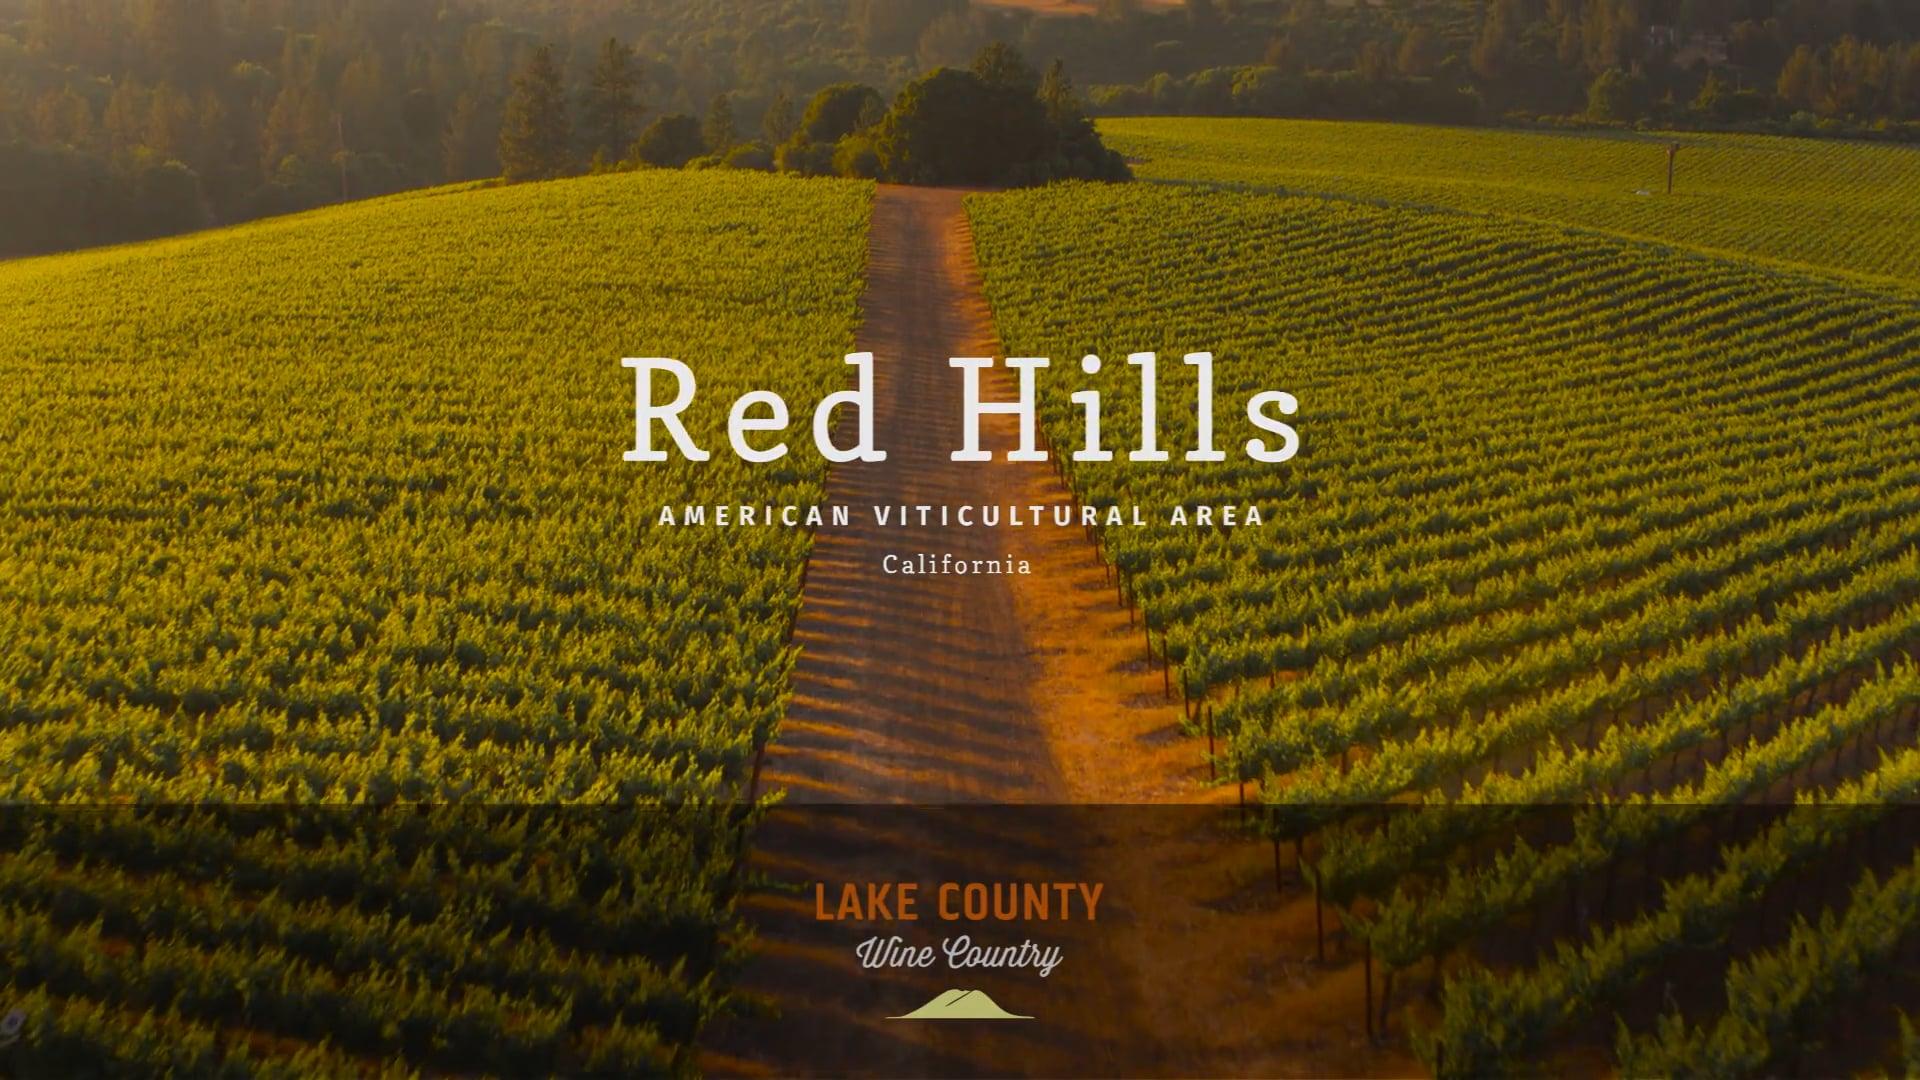 Red Hills American Viticultural Area Promo Spot